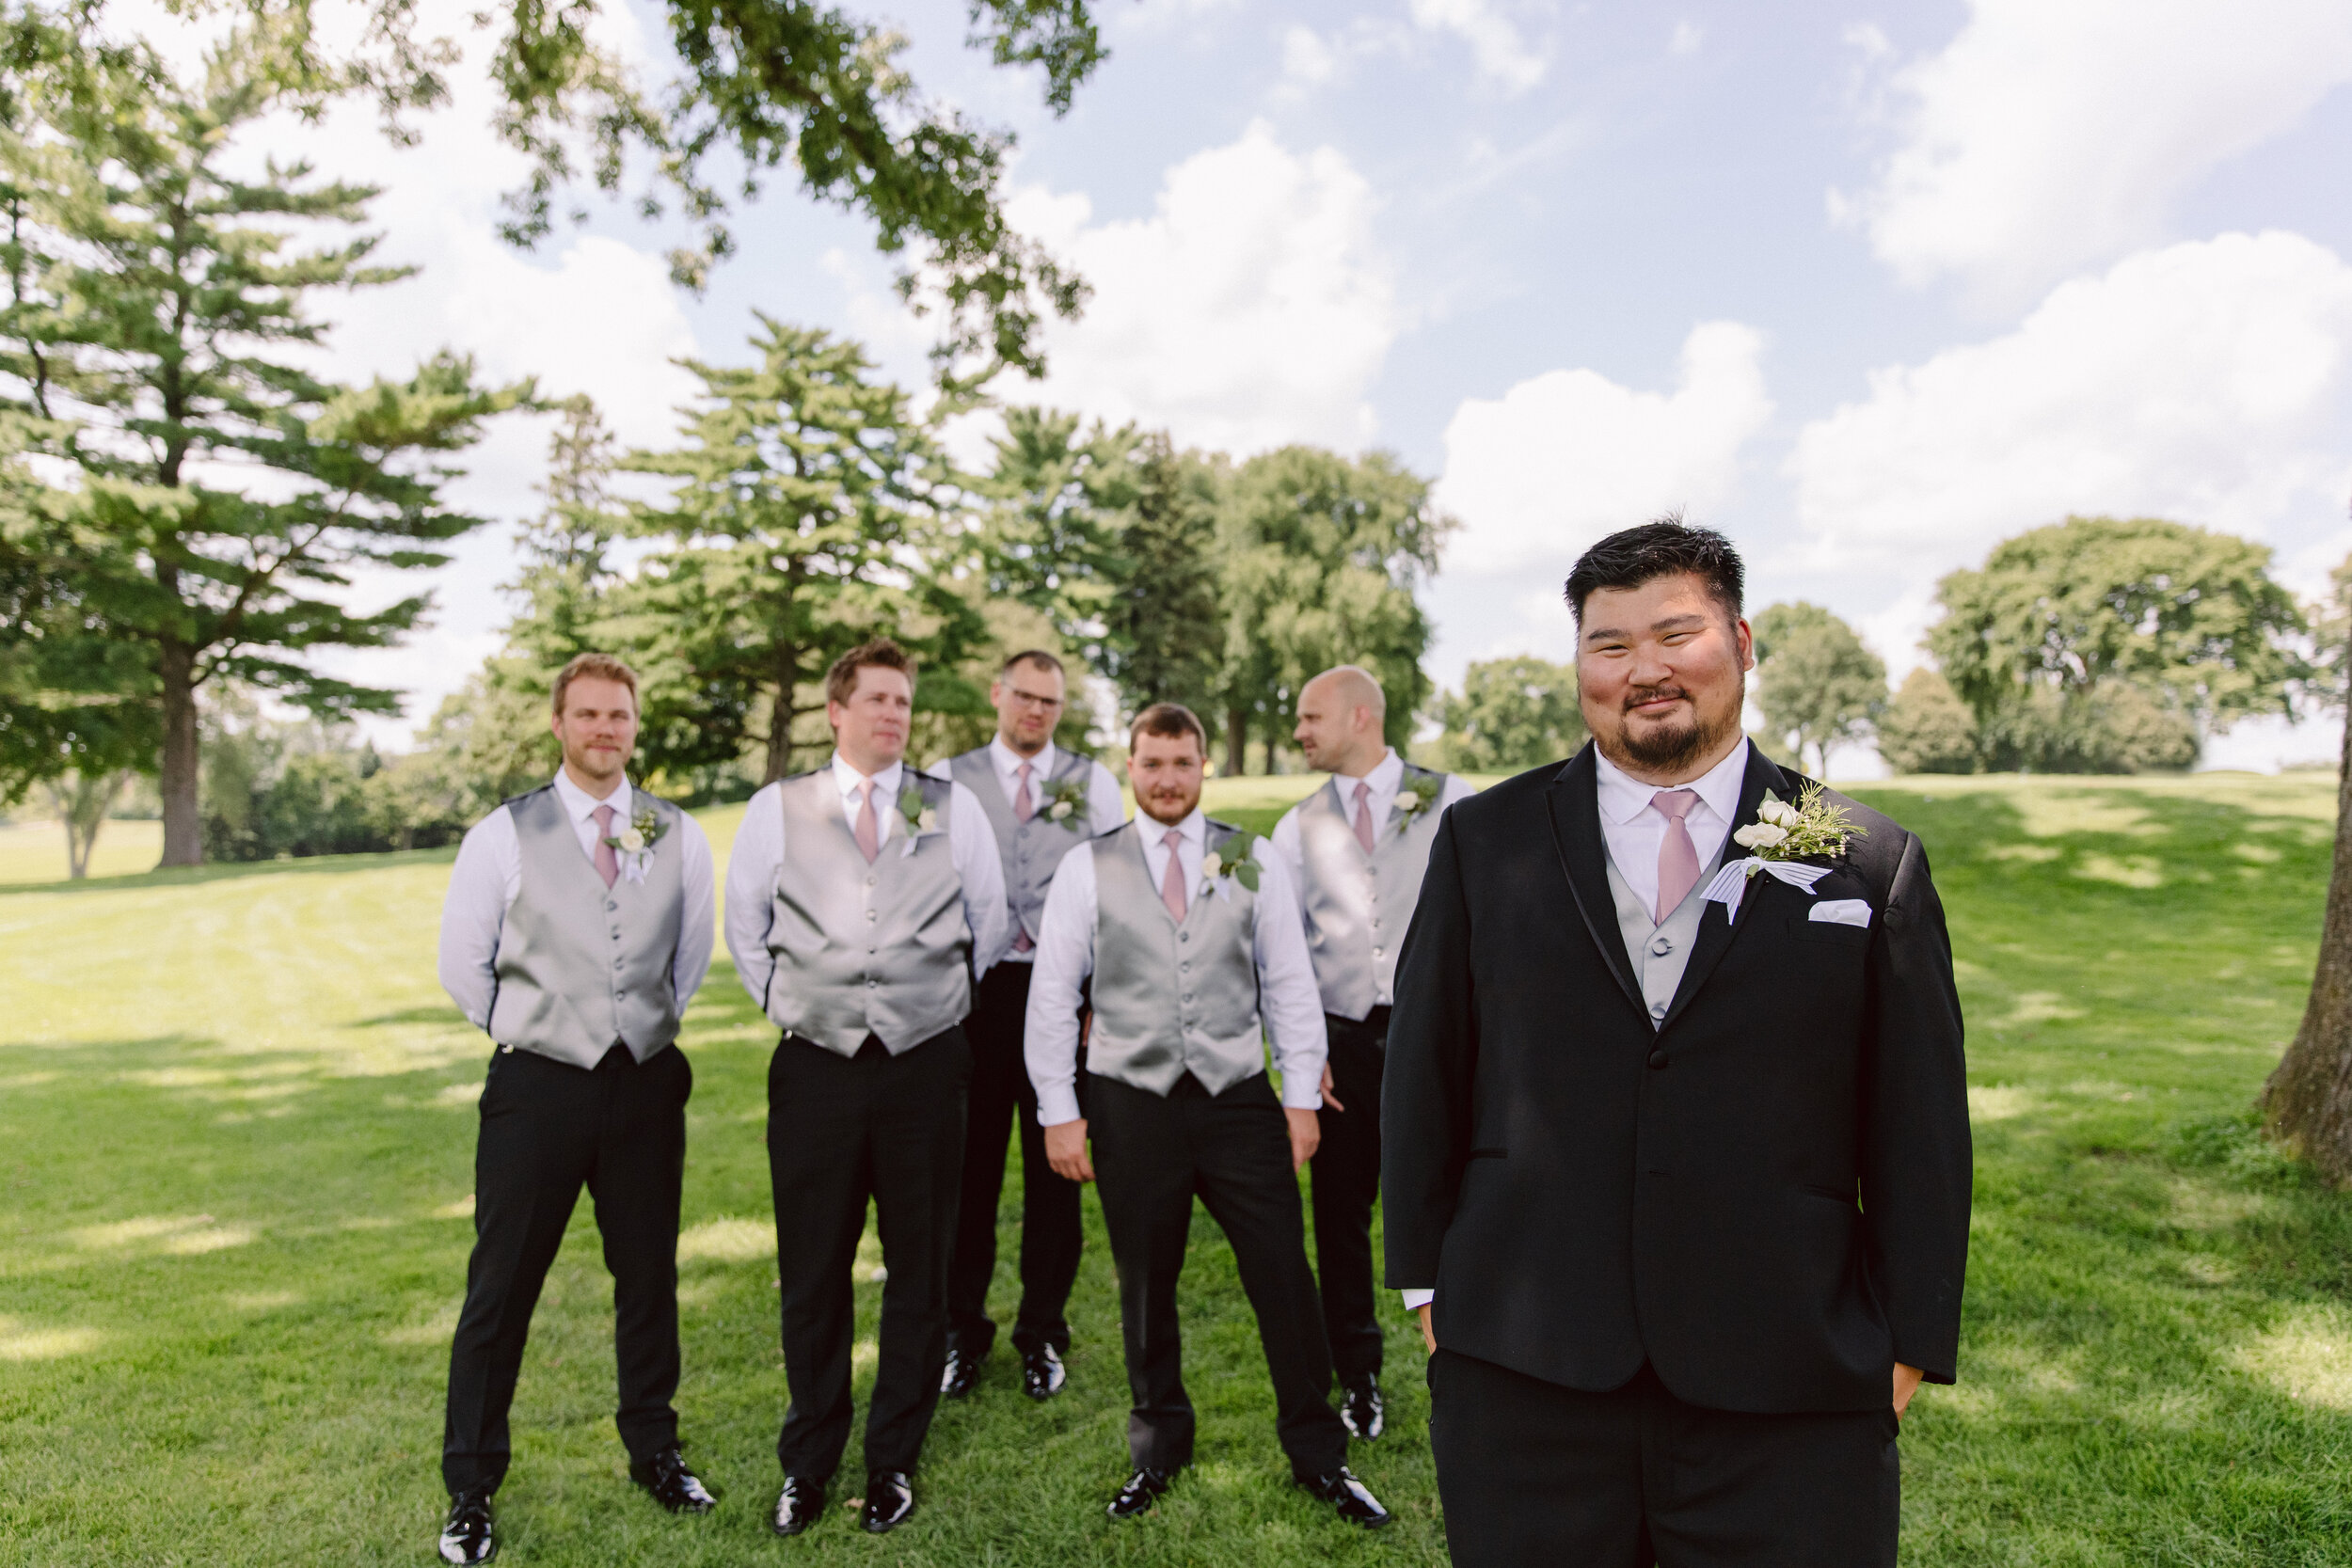 S&B Wedding - Family & Wedding Party-105.jpg